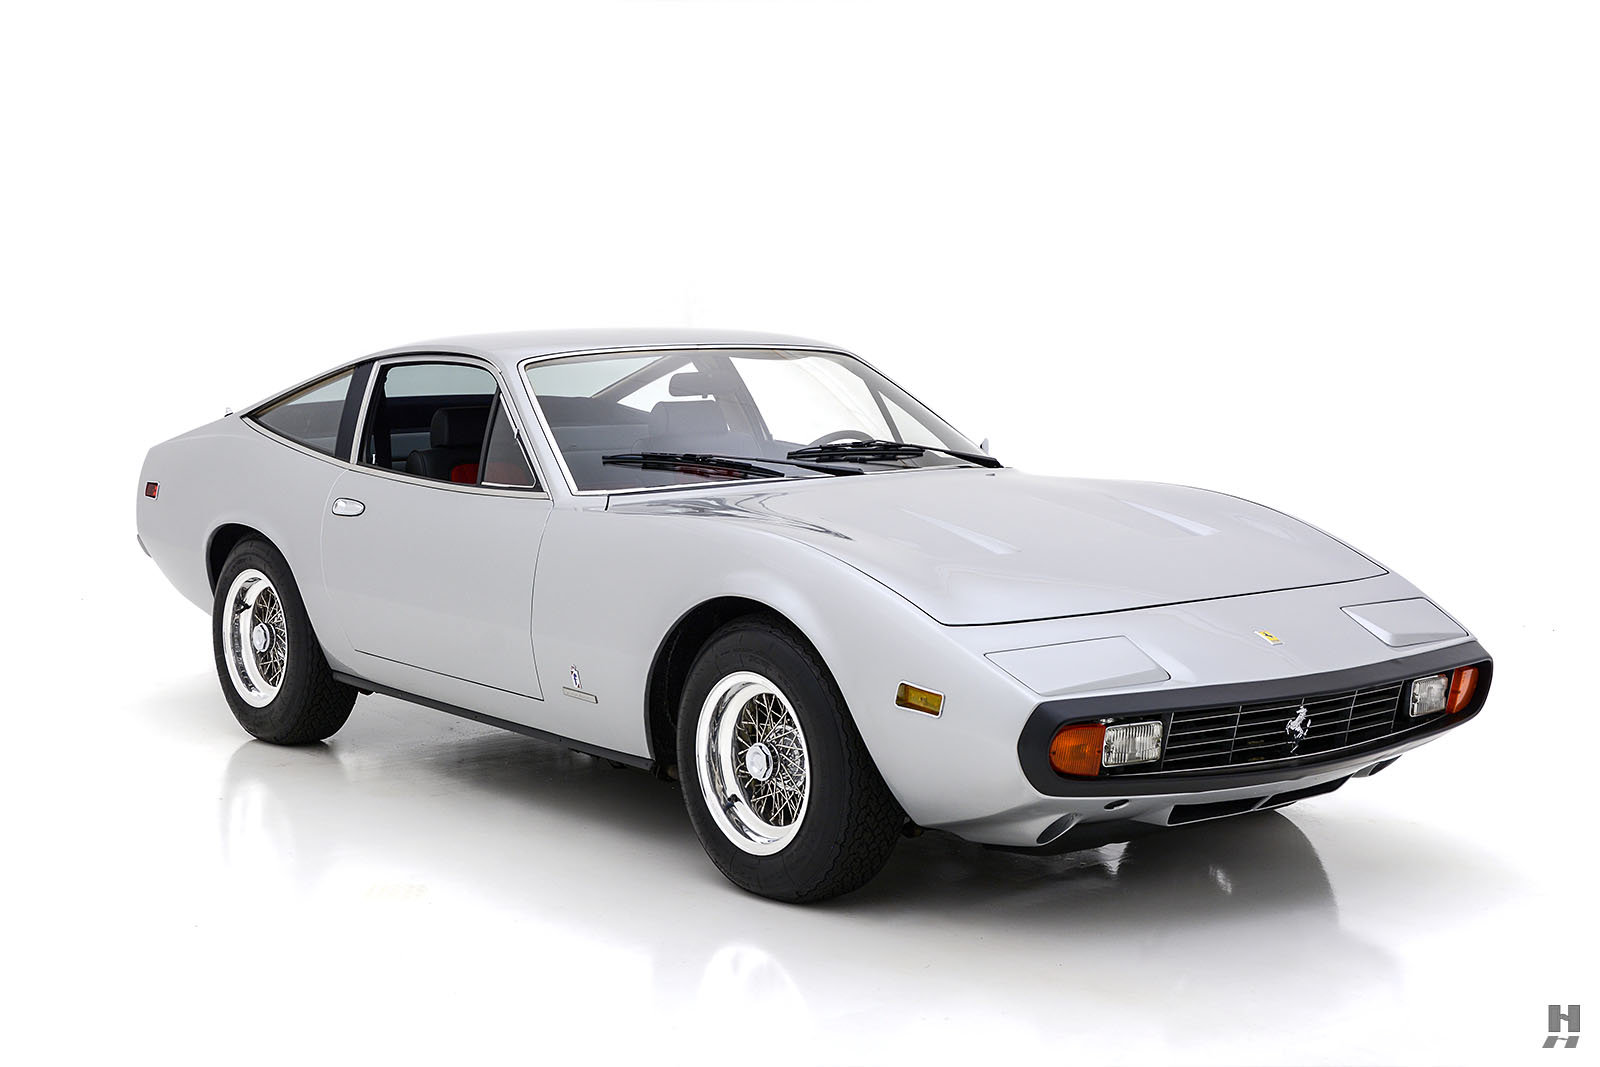 1972 FERRARI 365 GTC/4 COUPE For Sale (picture 2 of 6)